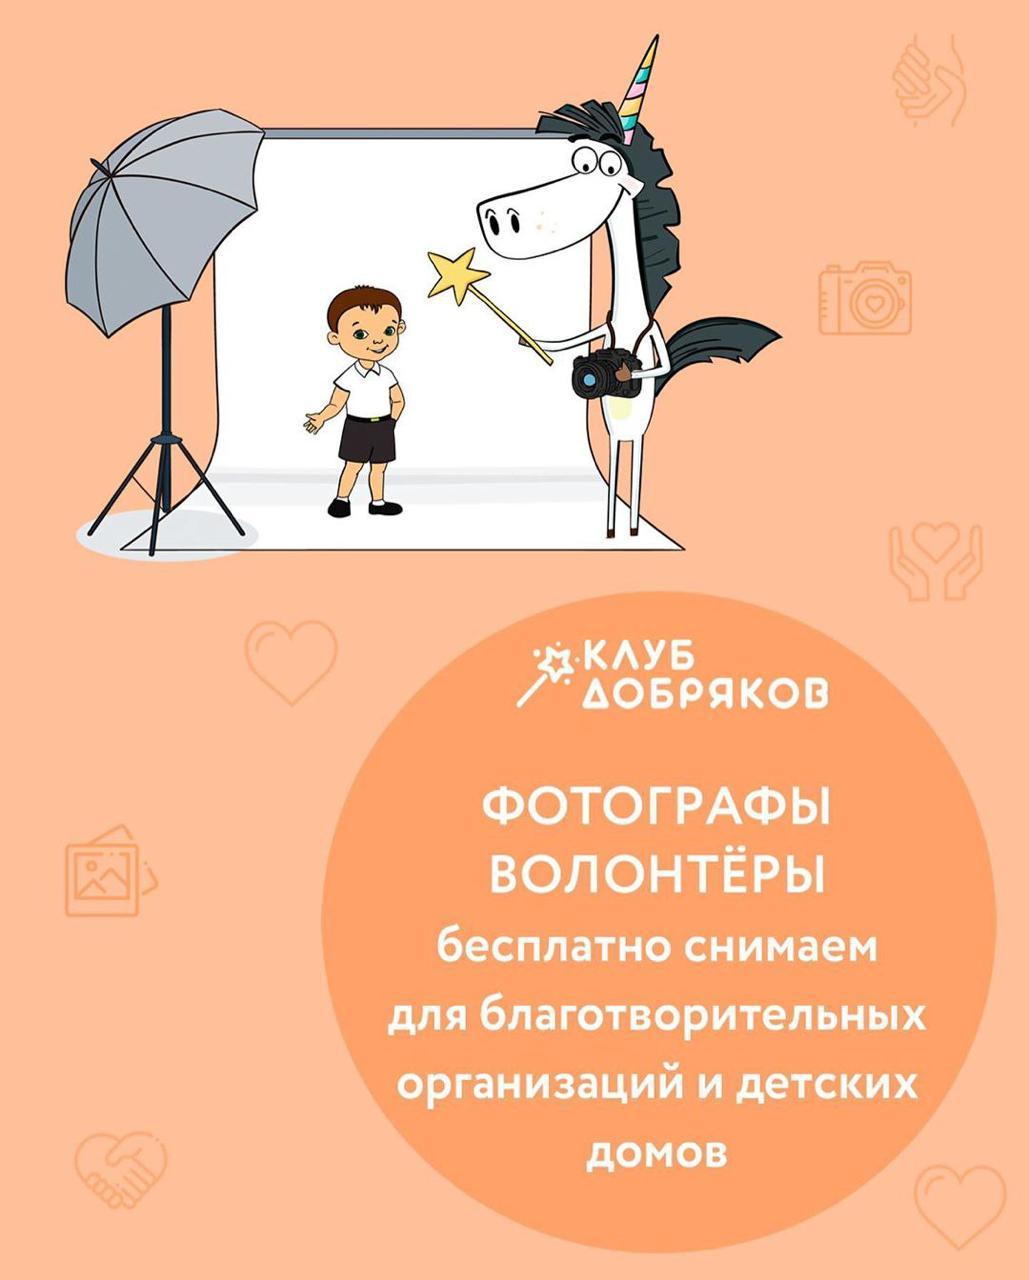 Добряки Петербурга запустили проект «Фотограф волонтер»